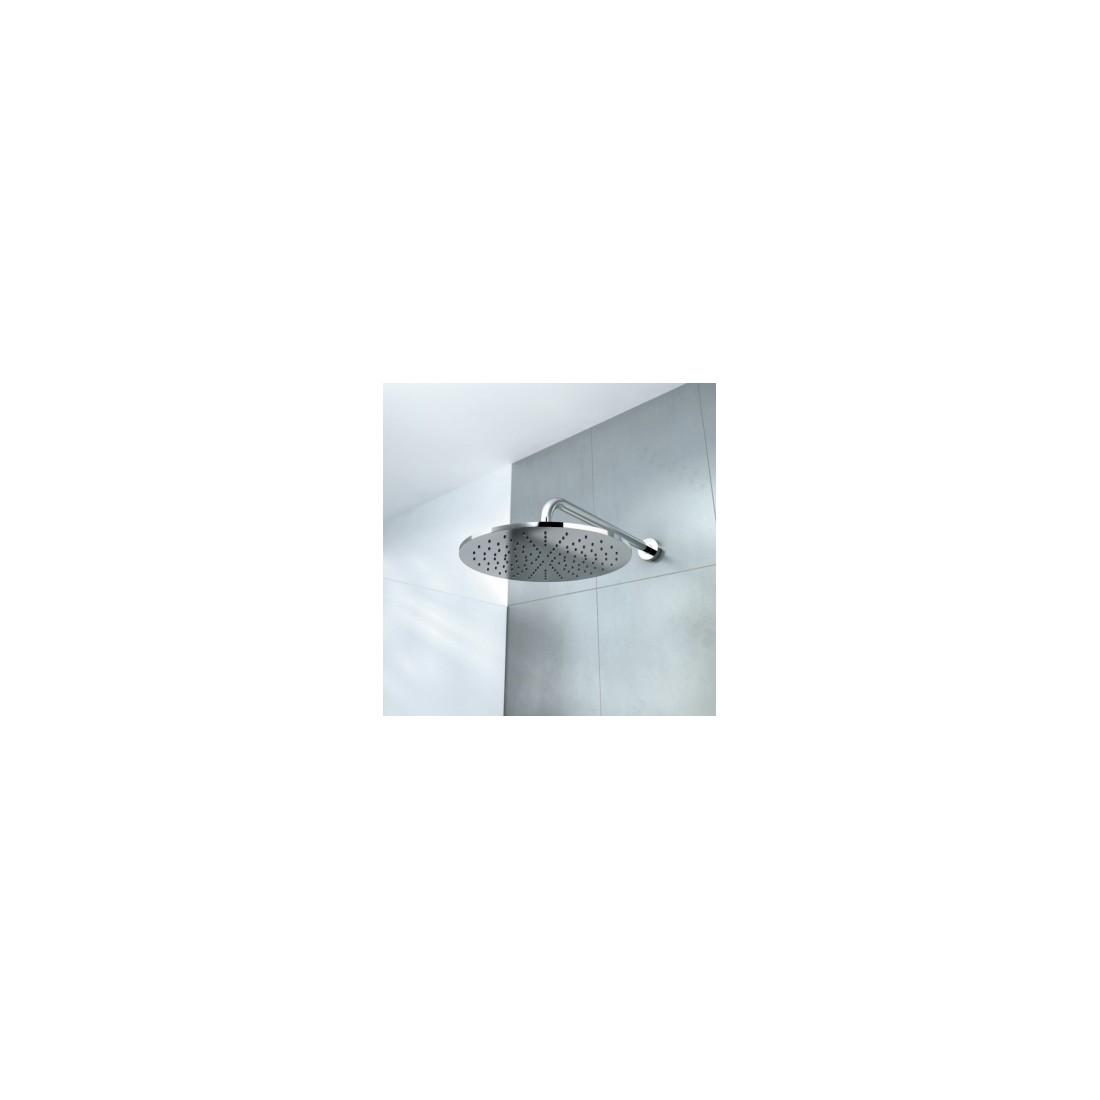 Dušo galvutės laikiklis IDEAL STANDARD IdealRain, potinkinis, 300 mm